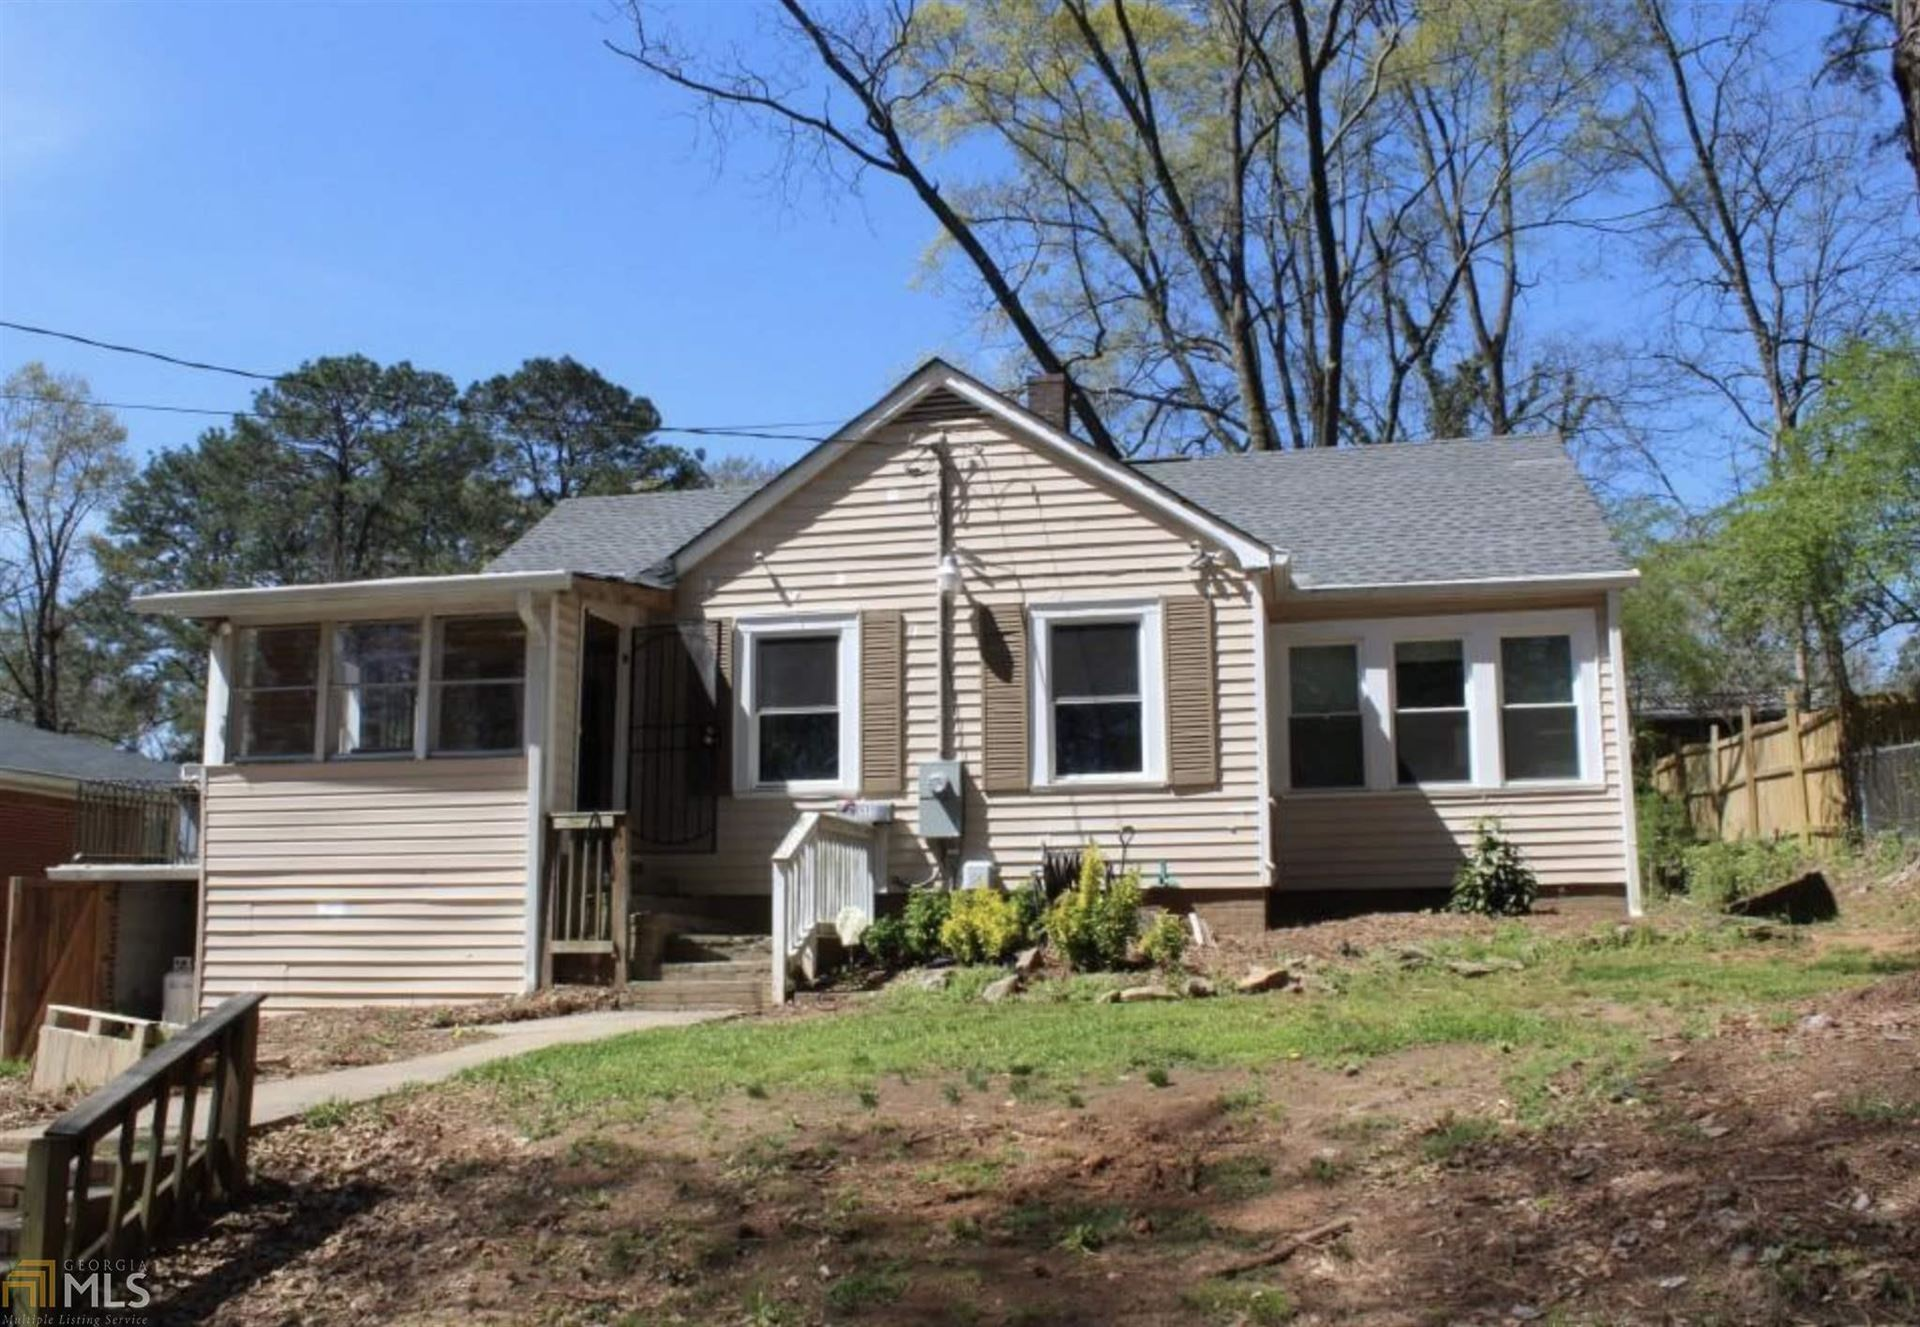 553 Marktrey Pl, Atlanta, GA 30318 - MLS#: 8907172